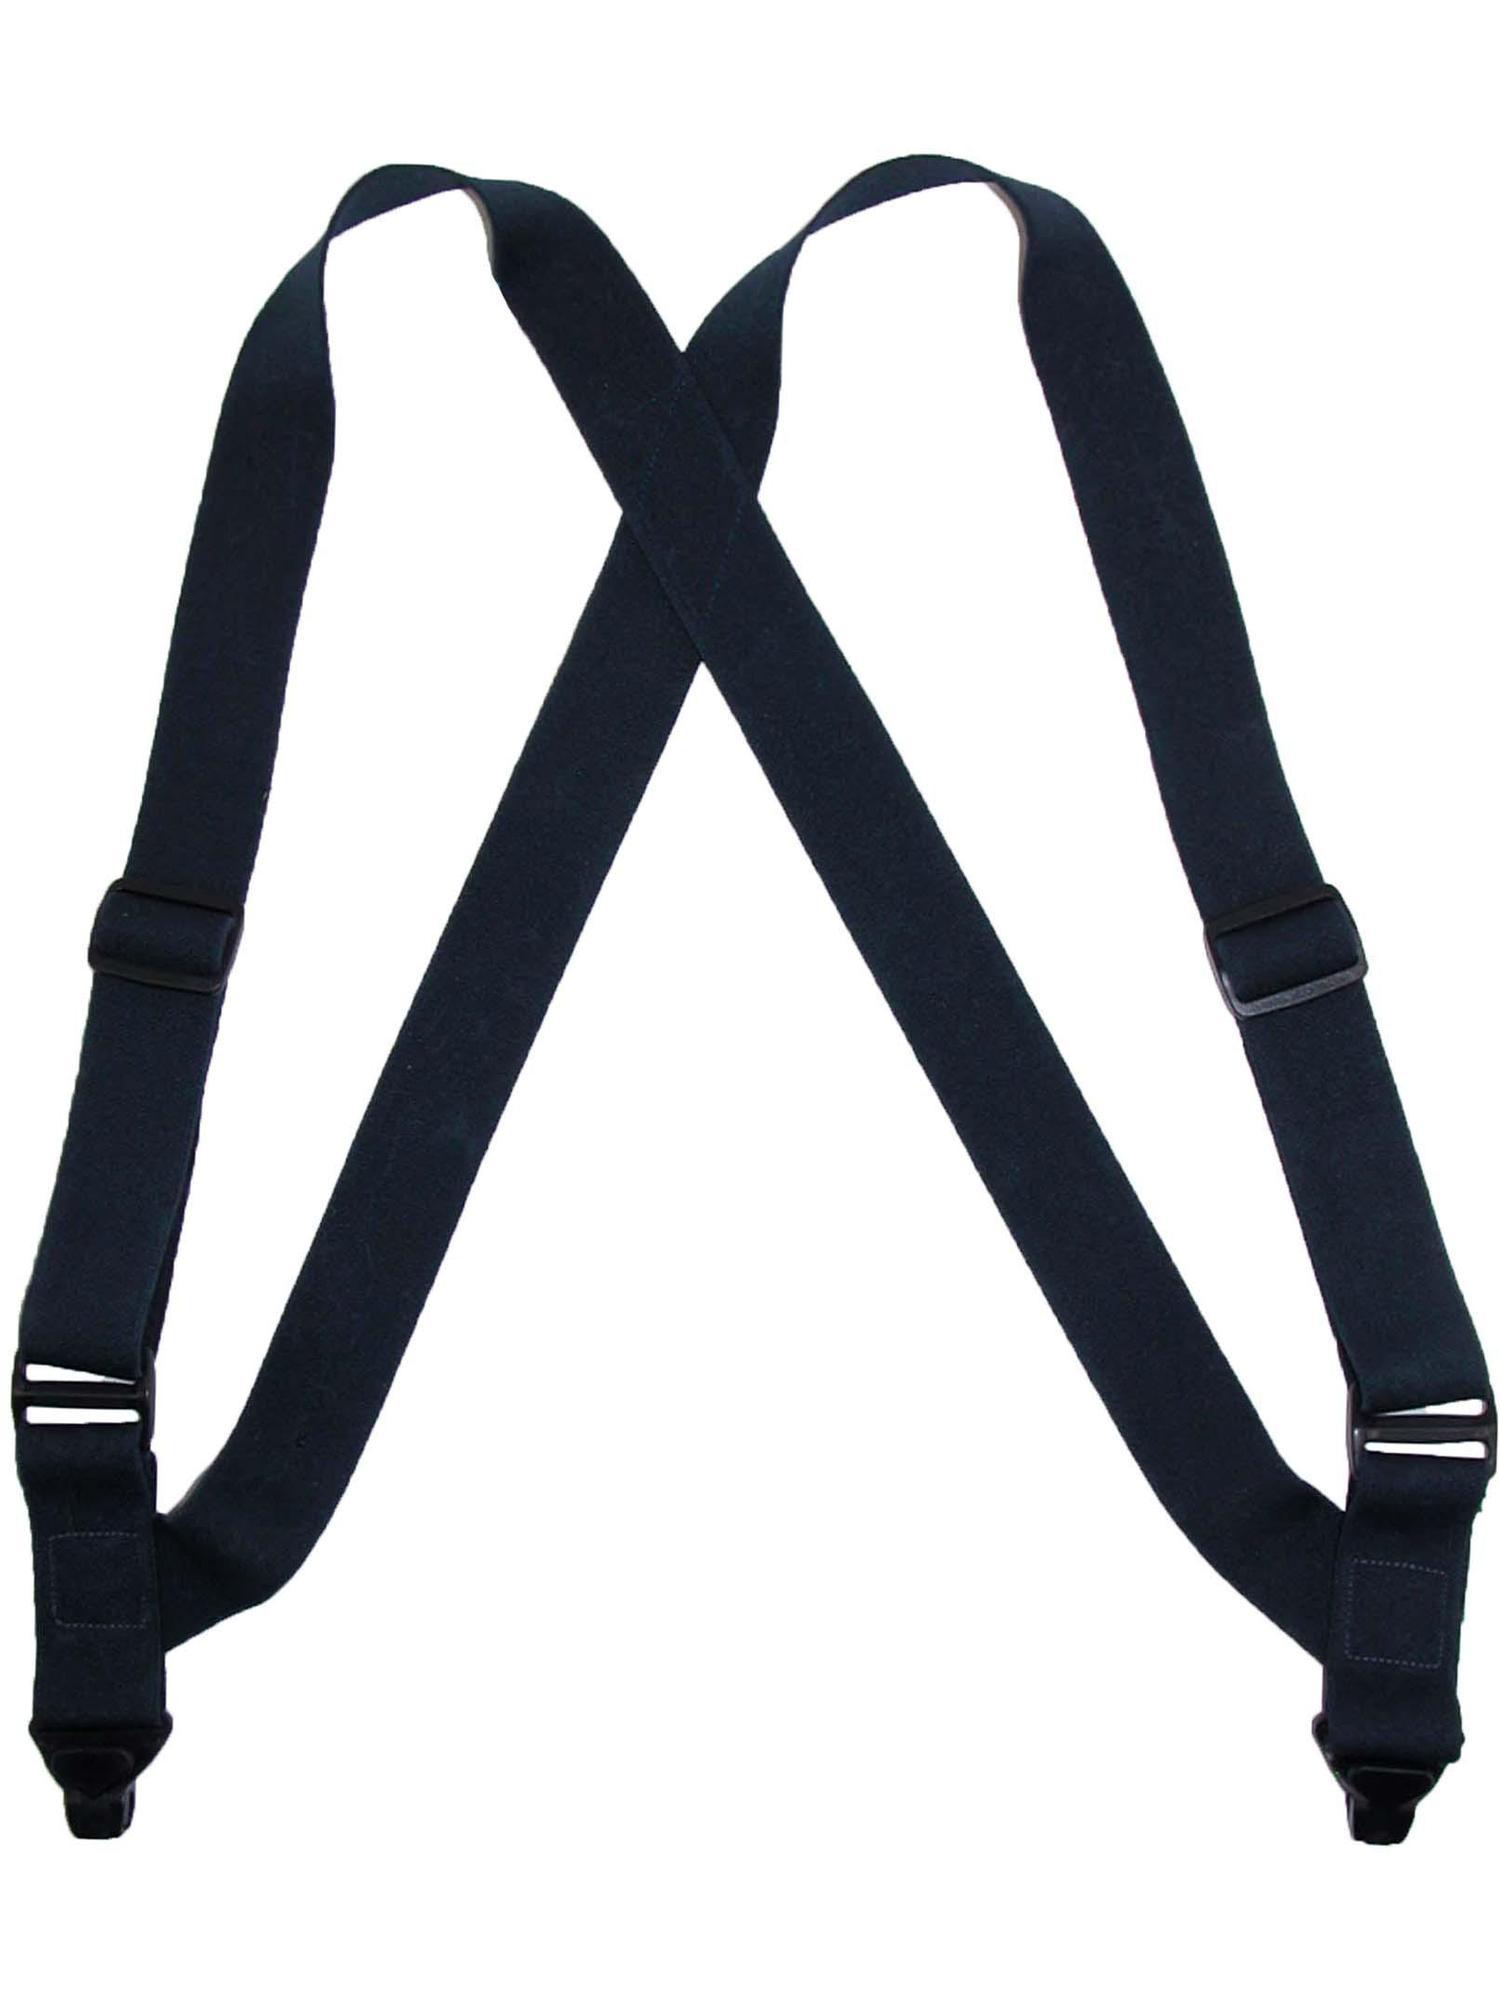 Black Elastic Plastic Clip-End TSA Compliant Airport Suspenders USA Made